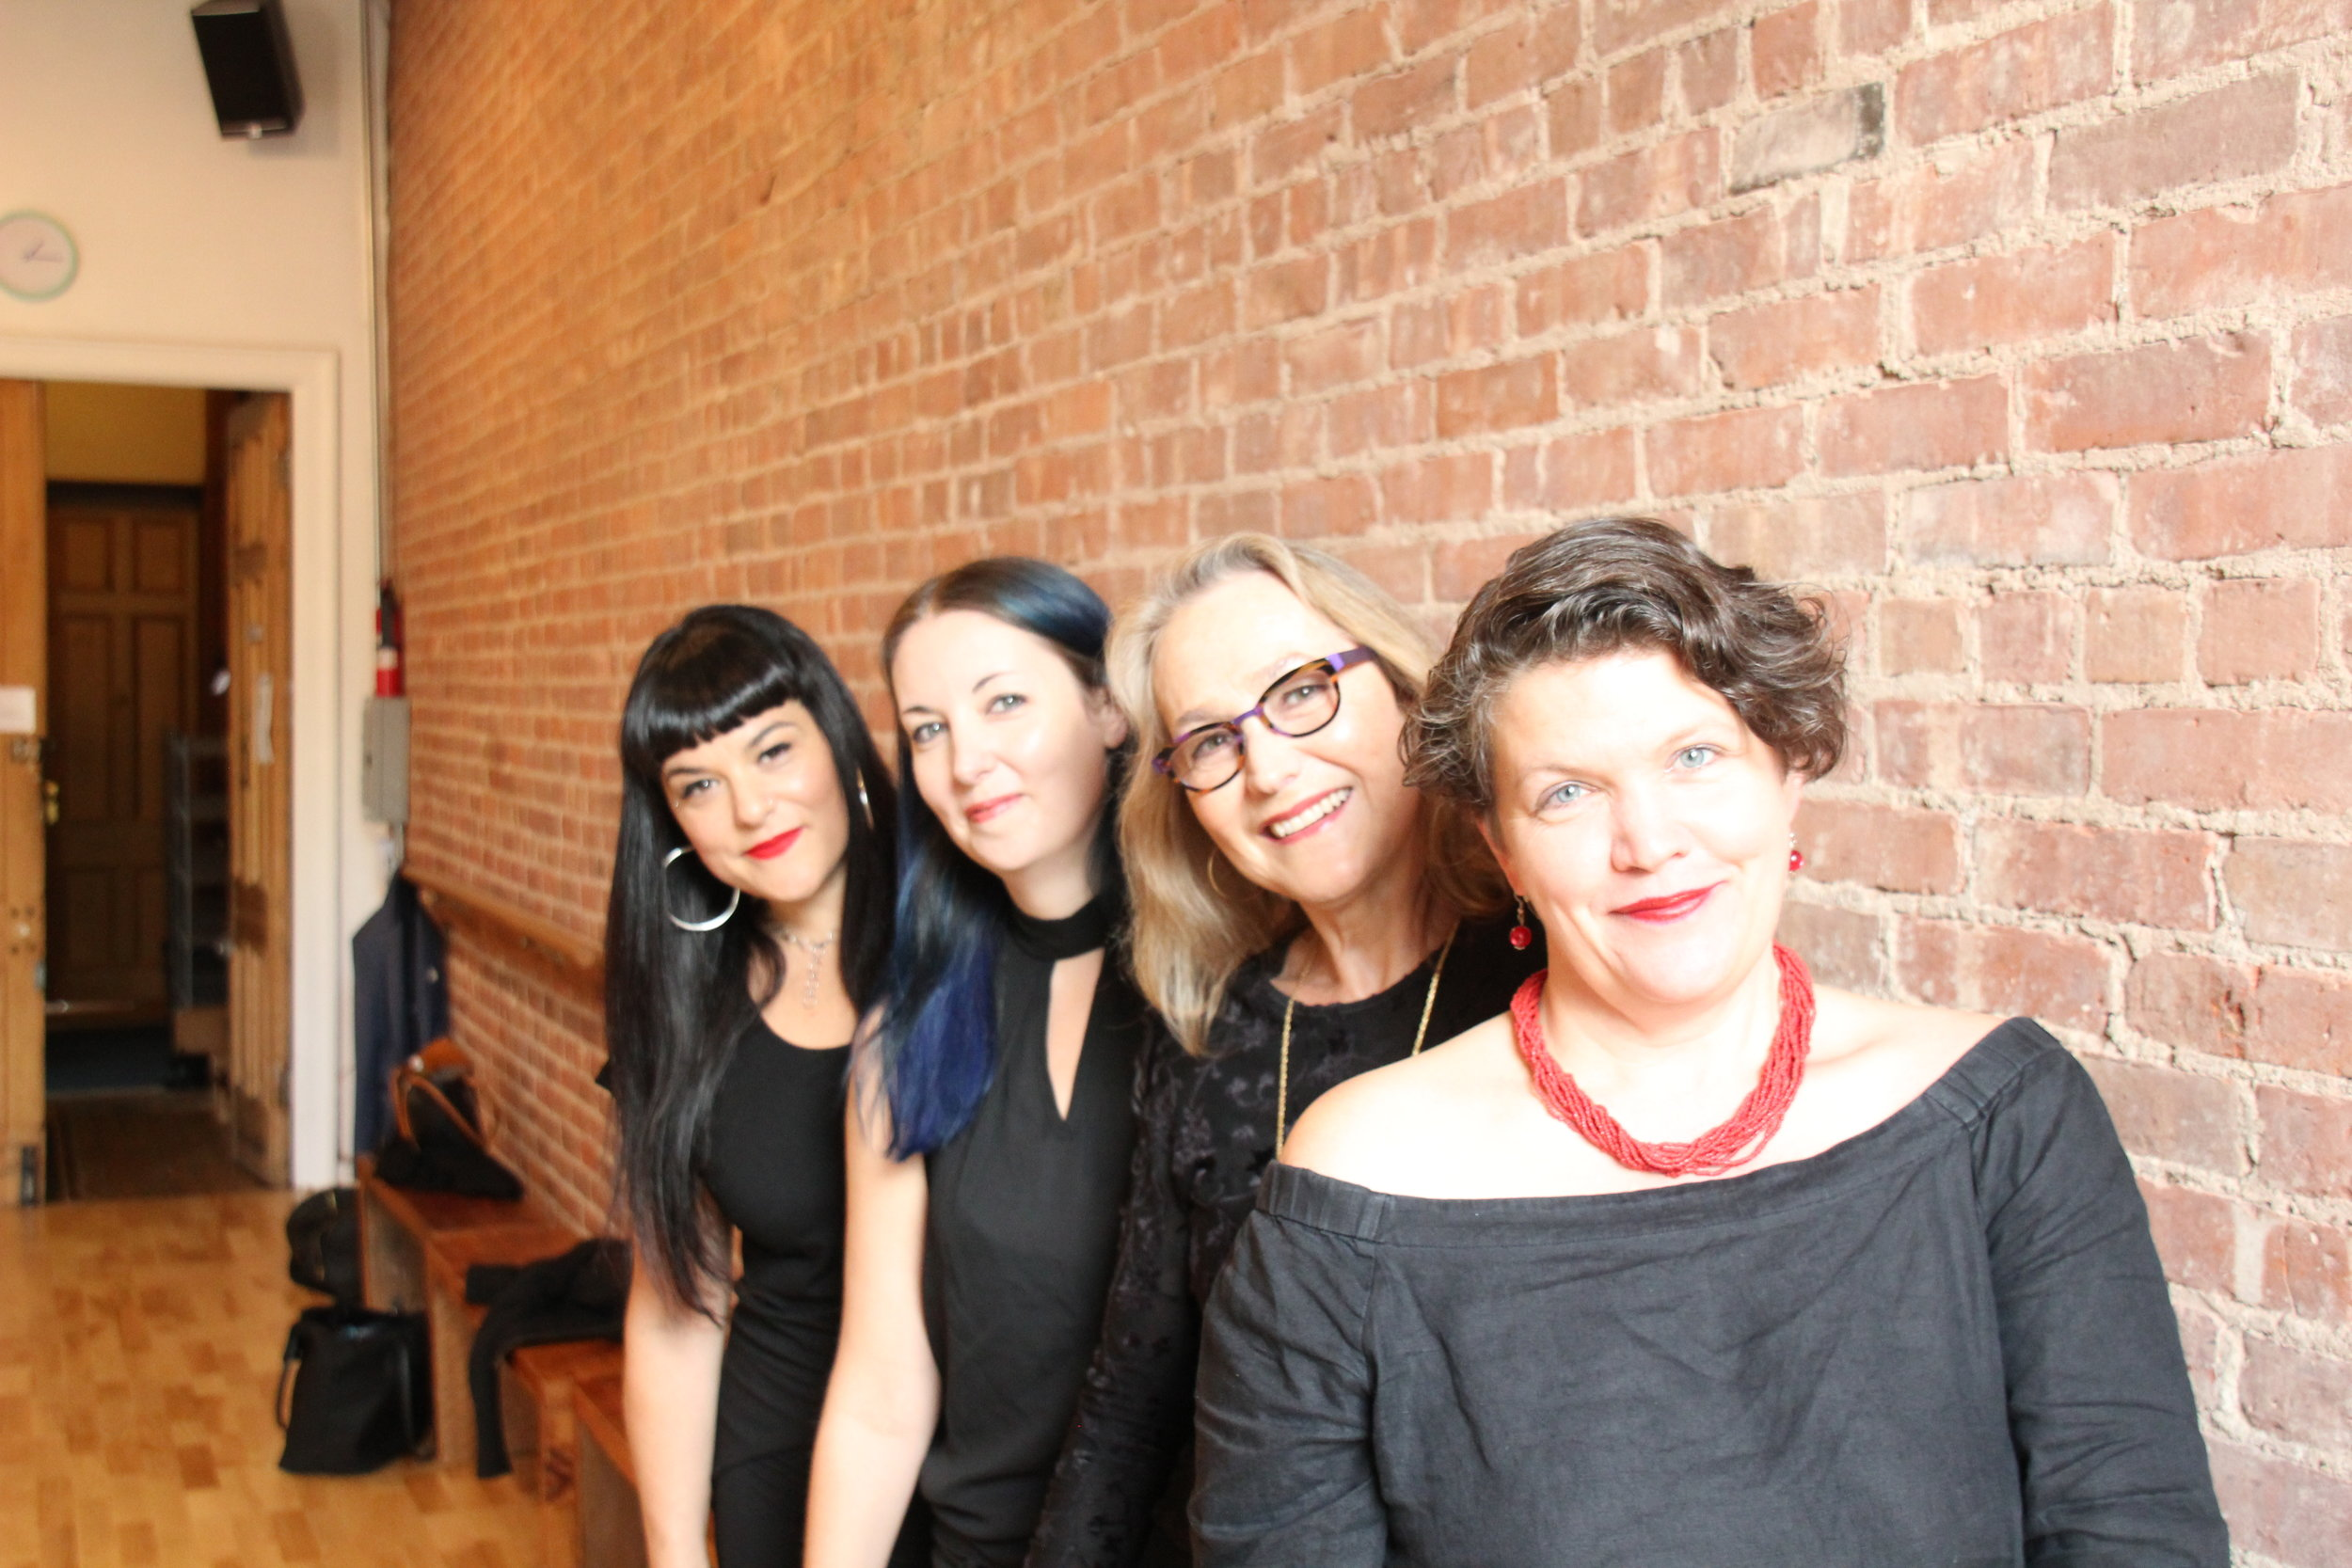 L->R: Beth Morrison, Jecca Barry, Kim Whitener, Kristin Marting Credit: Raul Zbengheci